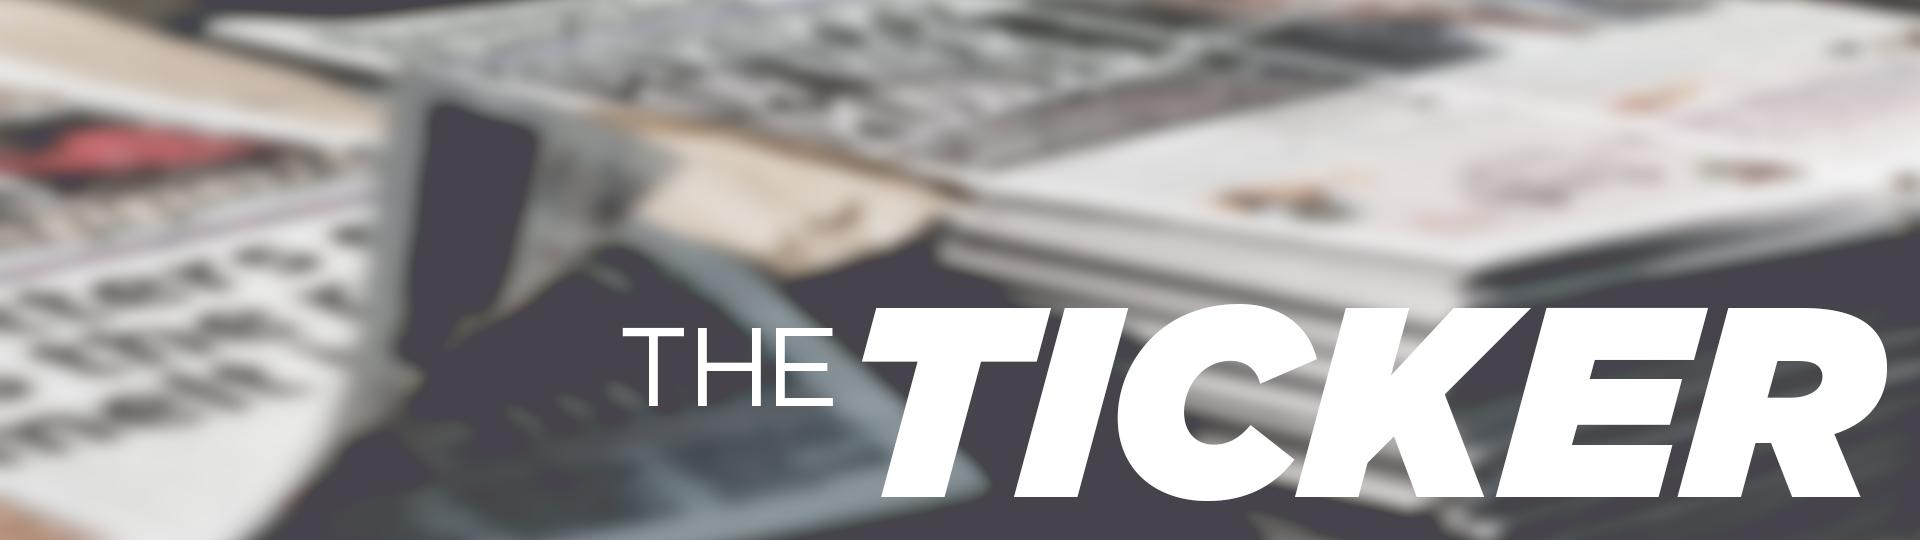 The Ticker.jpg